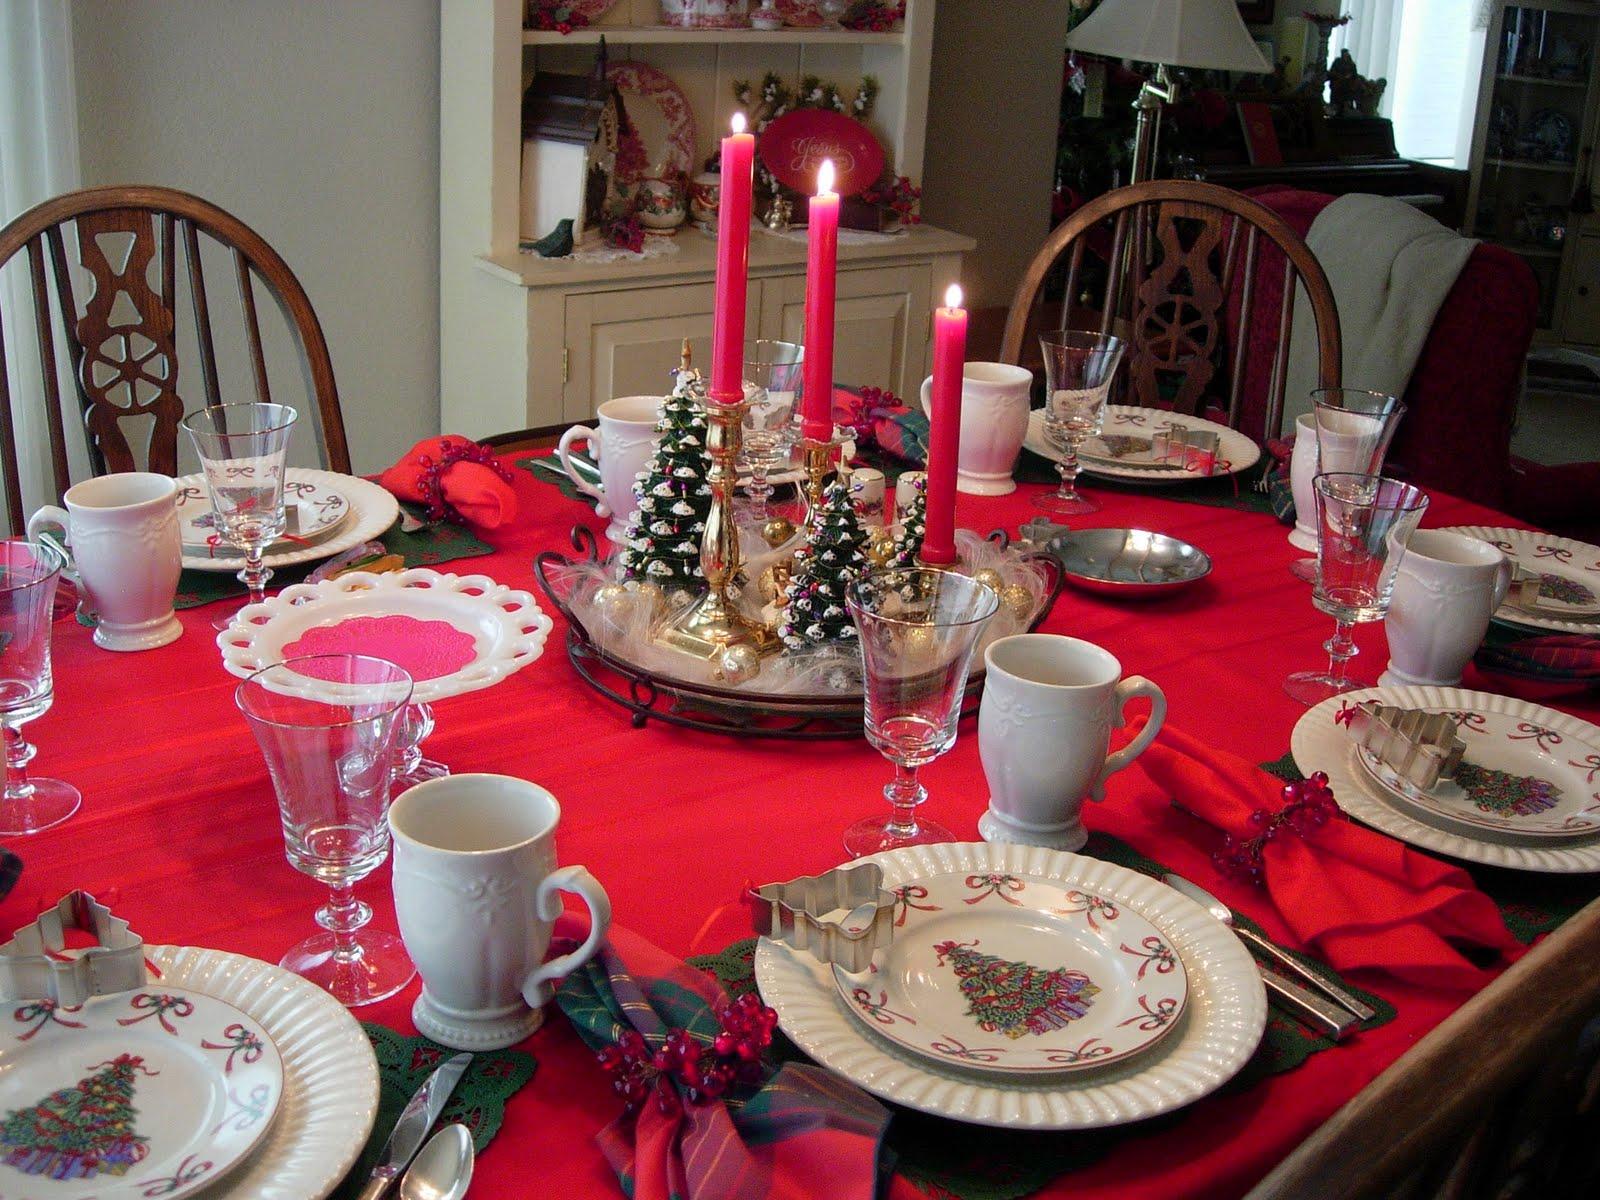 Nikko Christmastime Dinnerware - Castrophotos